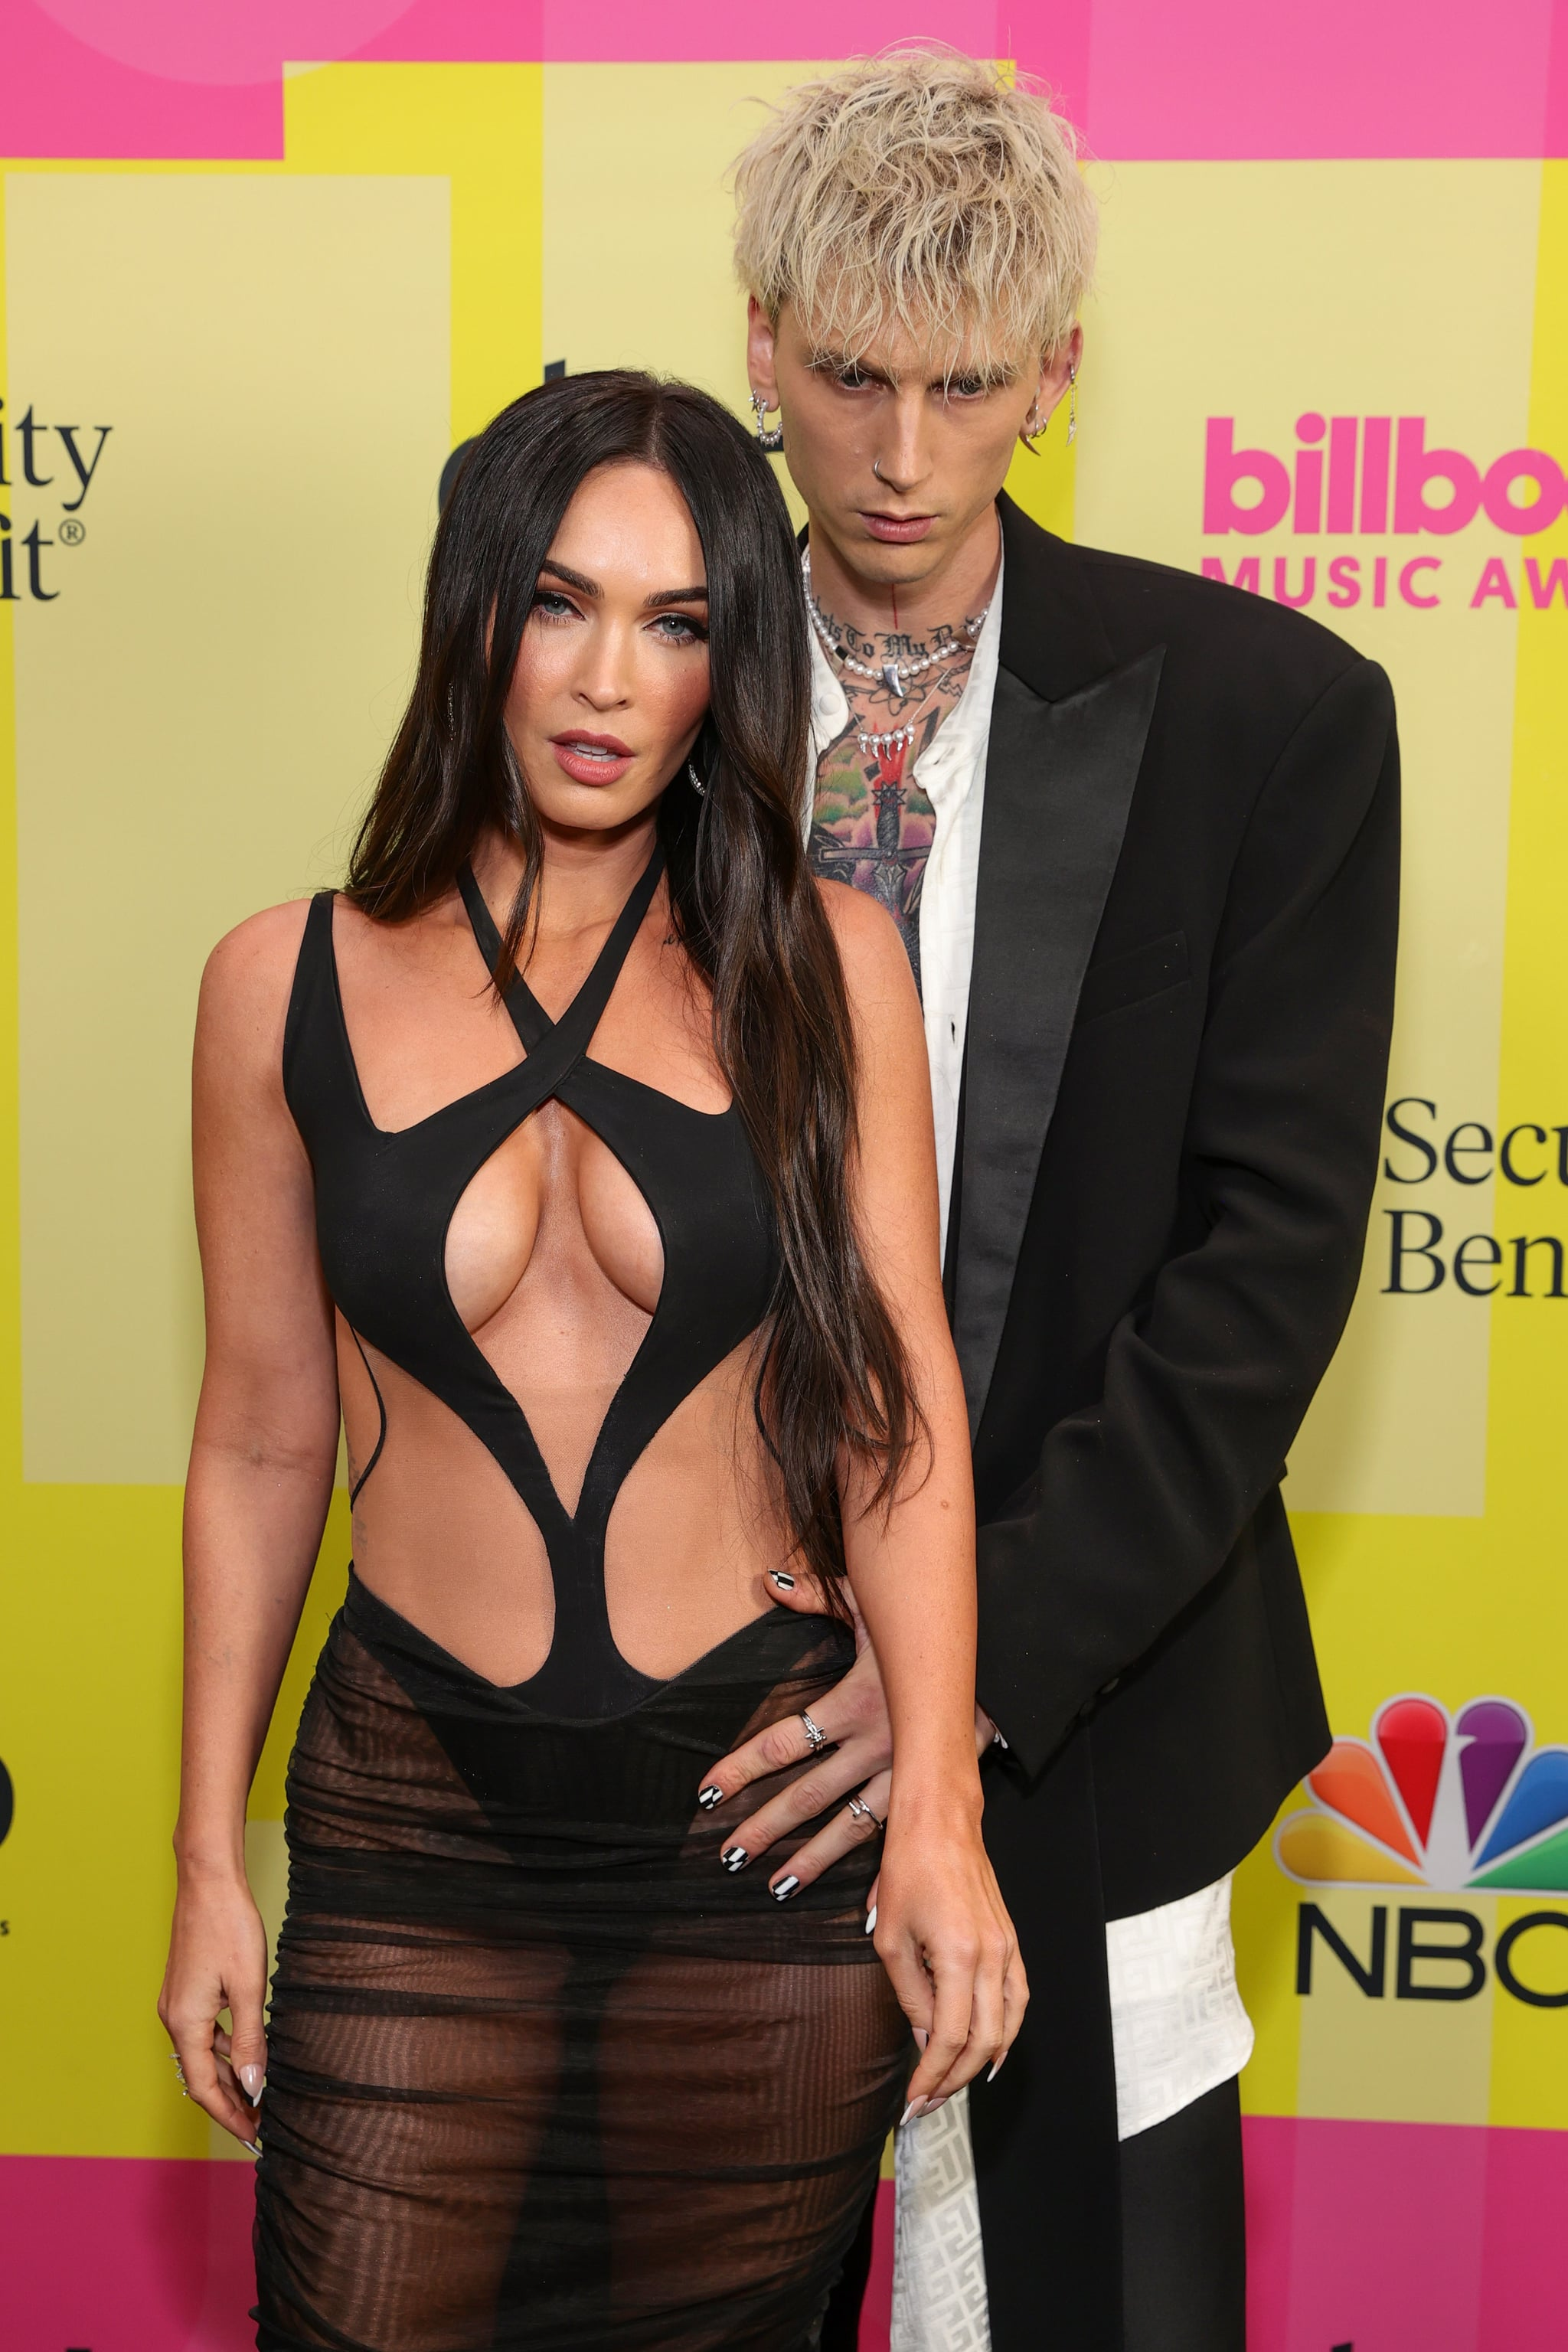 Kim Kardashian and Megan Fox's Sexy Cutout Mugler Dresses | POPSUGAR Fashion